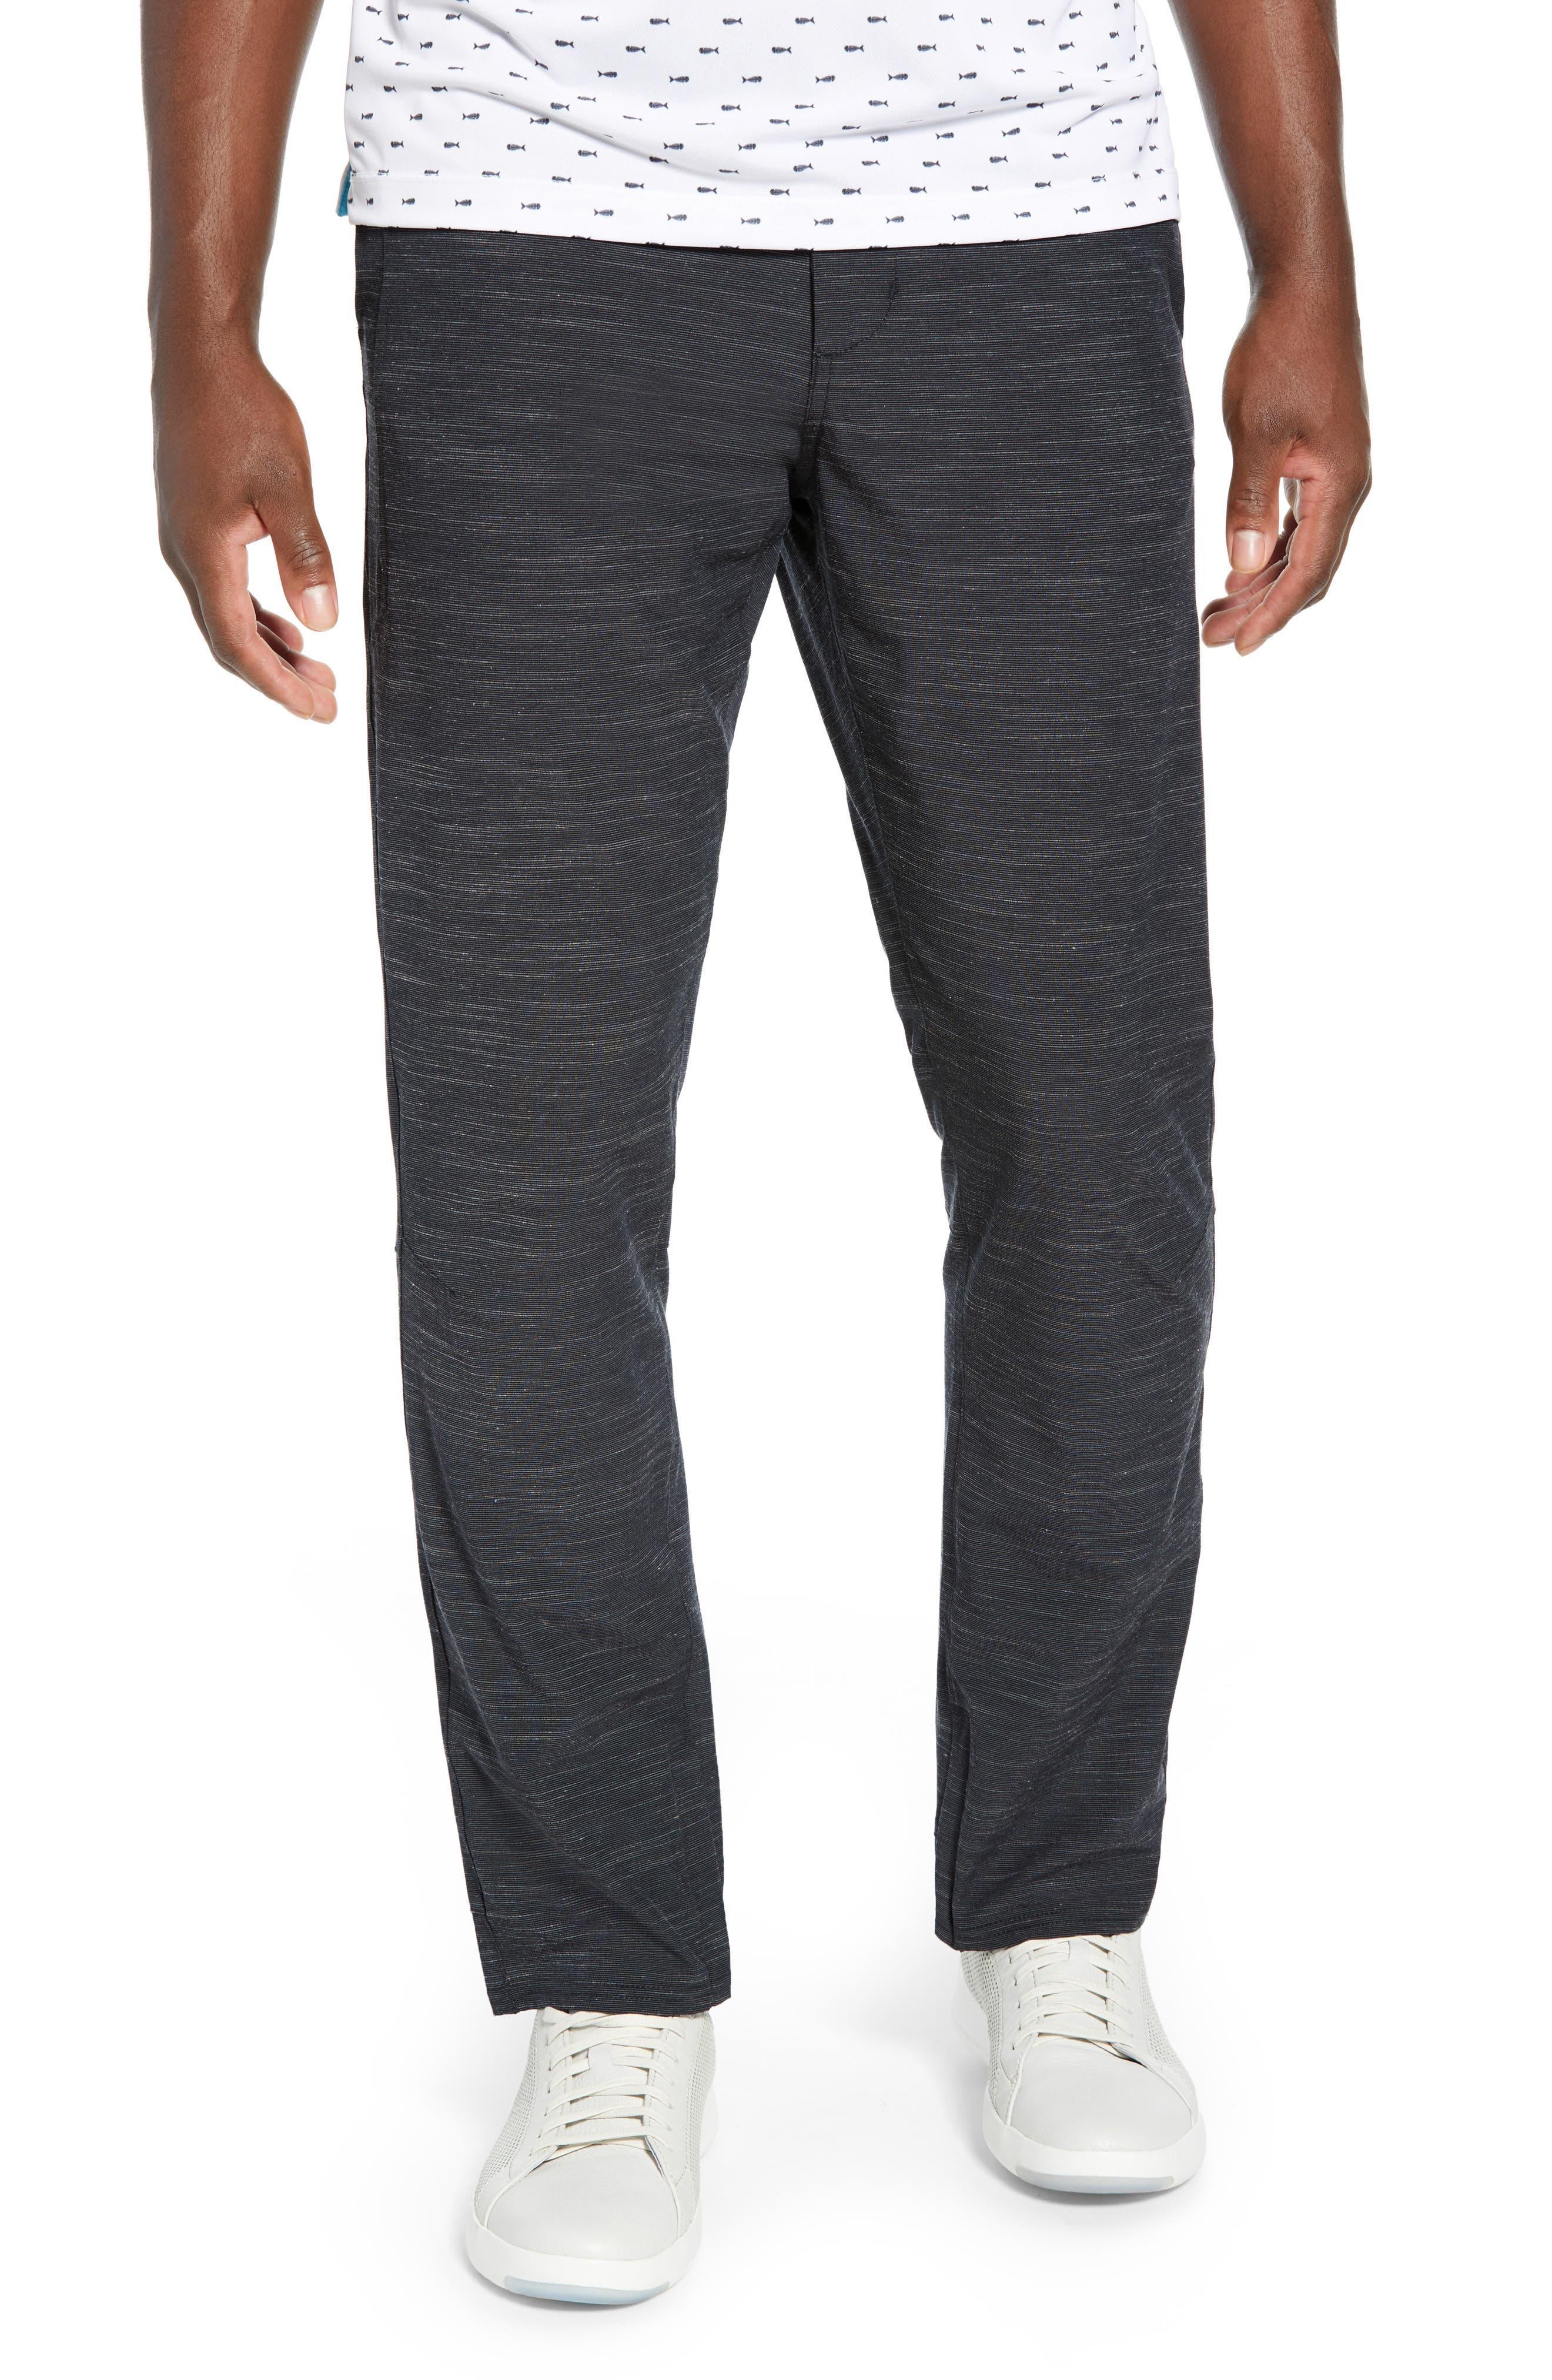 Gravity Athletic Fit Pants,                         Main,                         color, 002